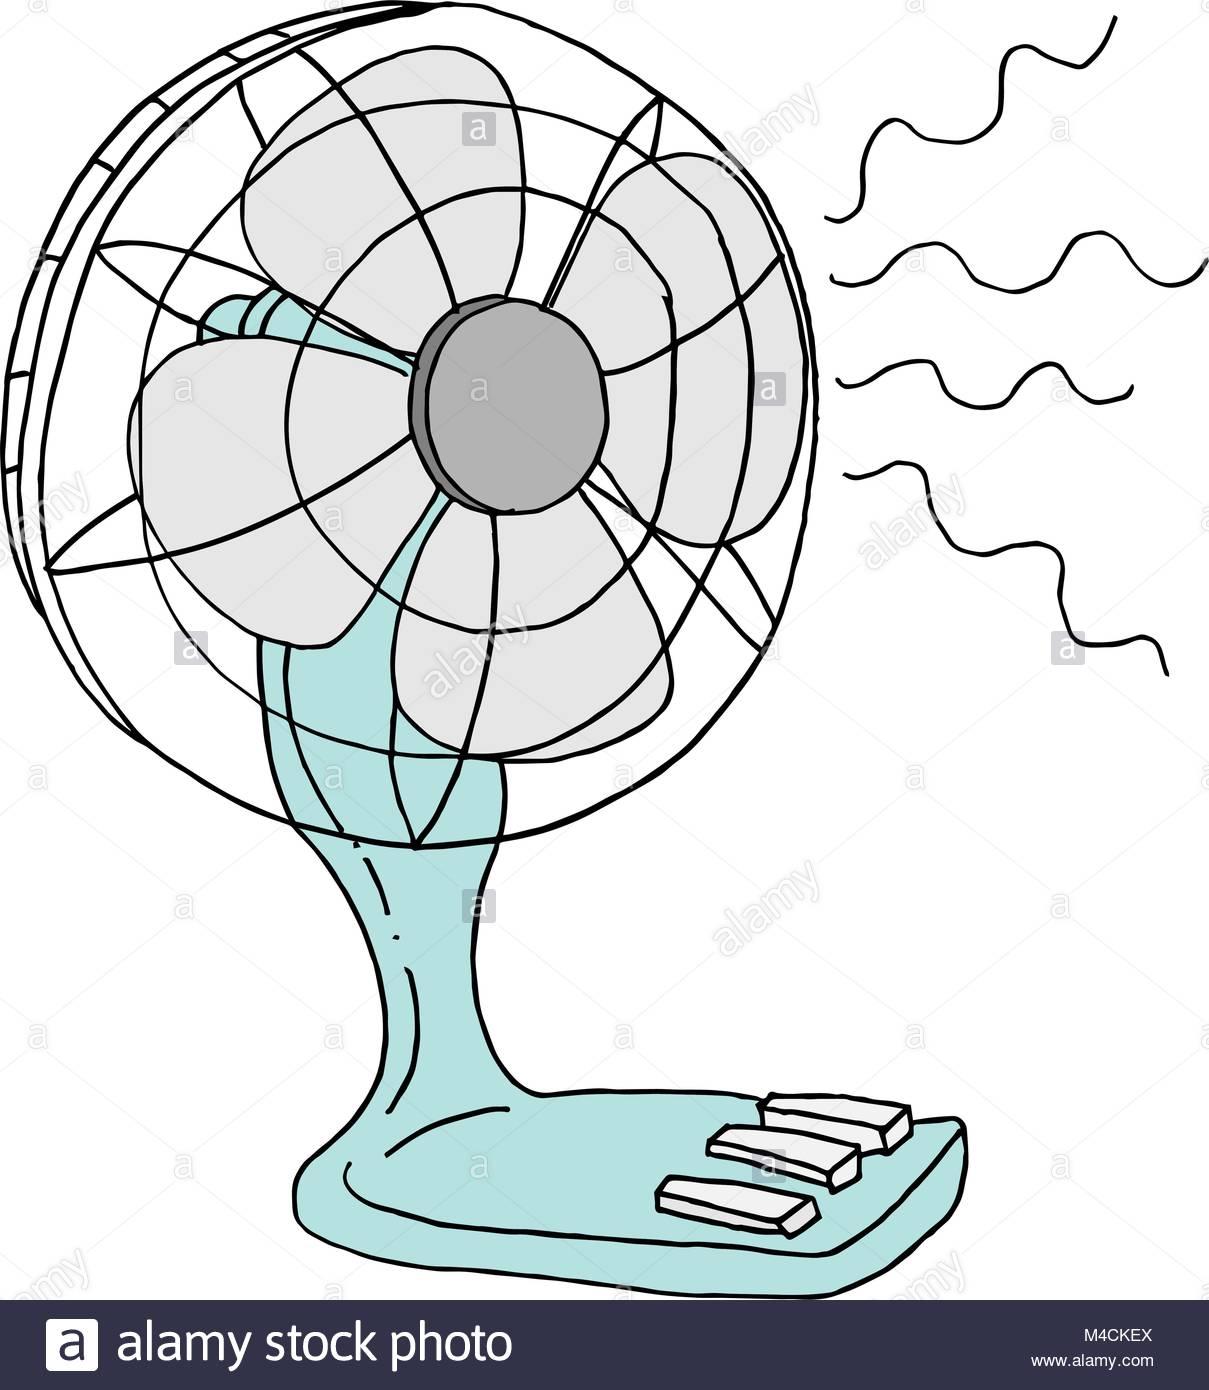 An image of a small desk electric desk fan Stock Vector Art.